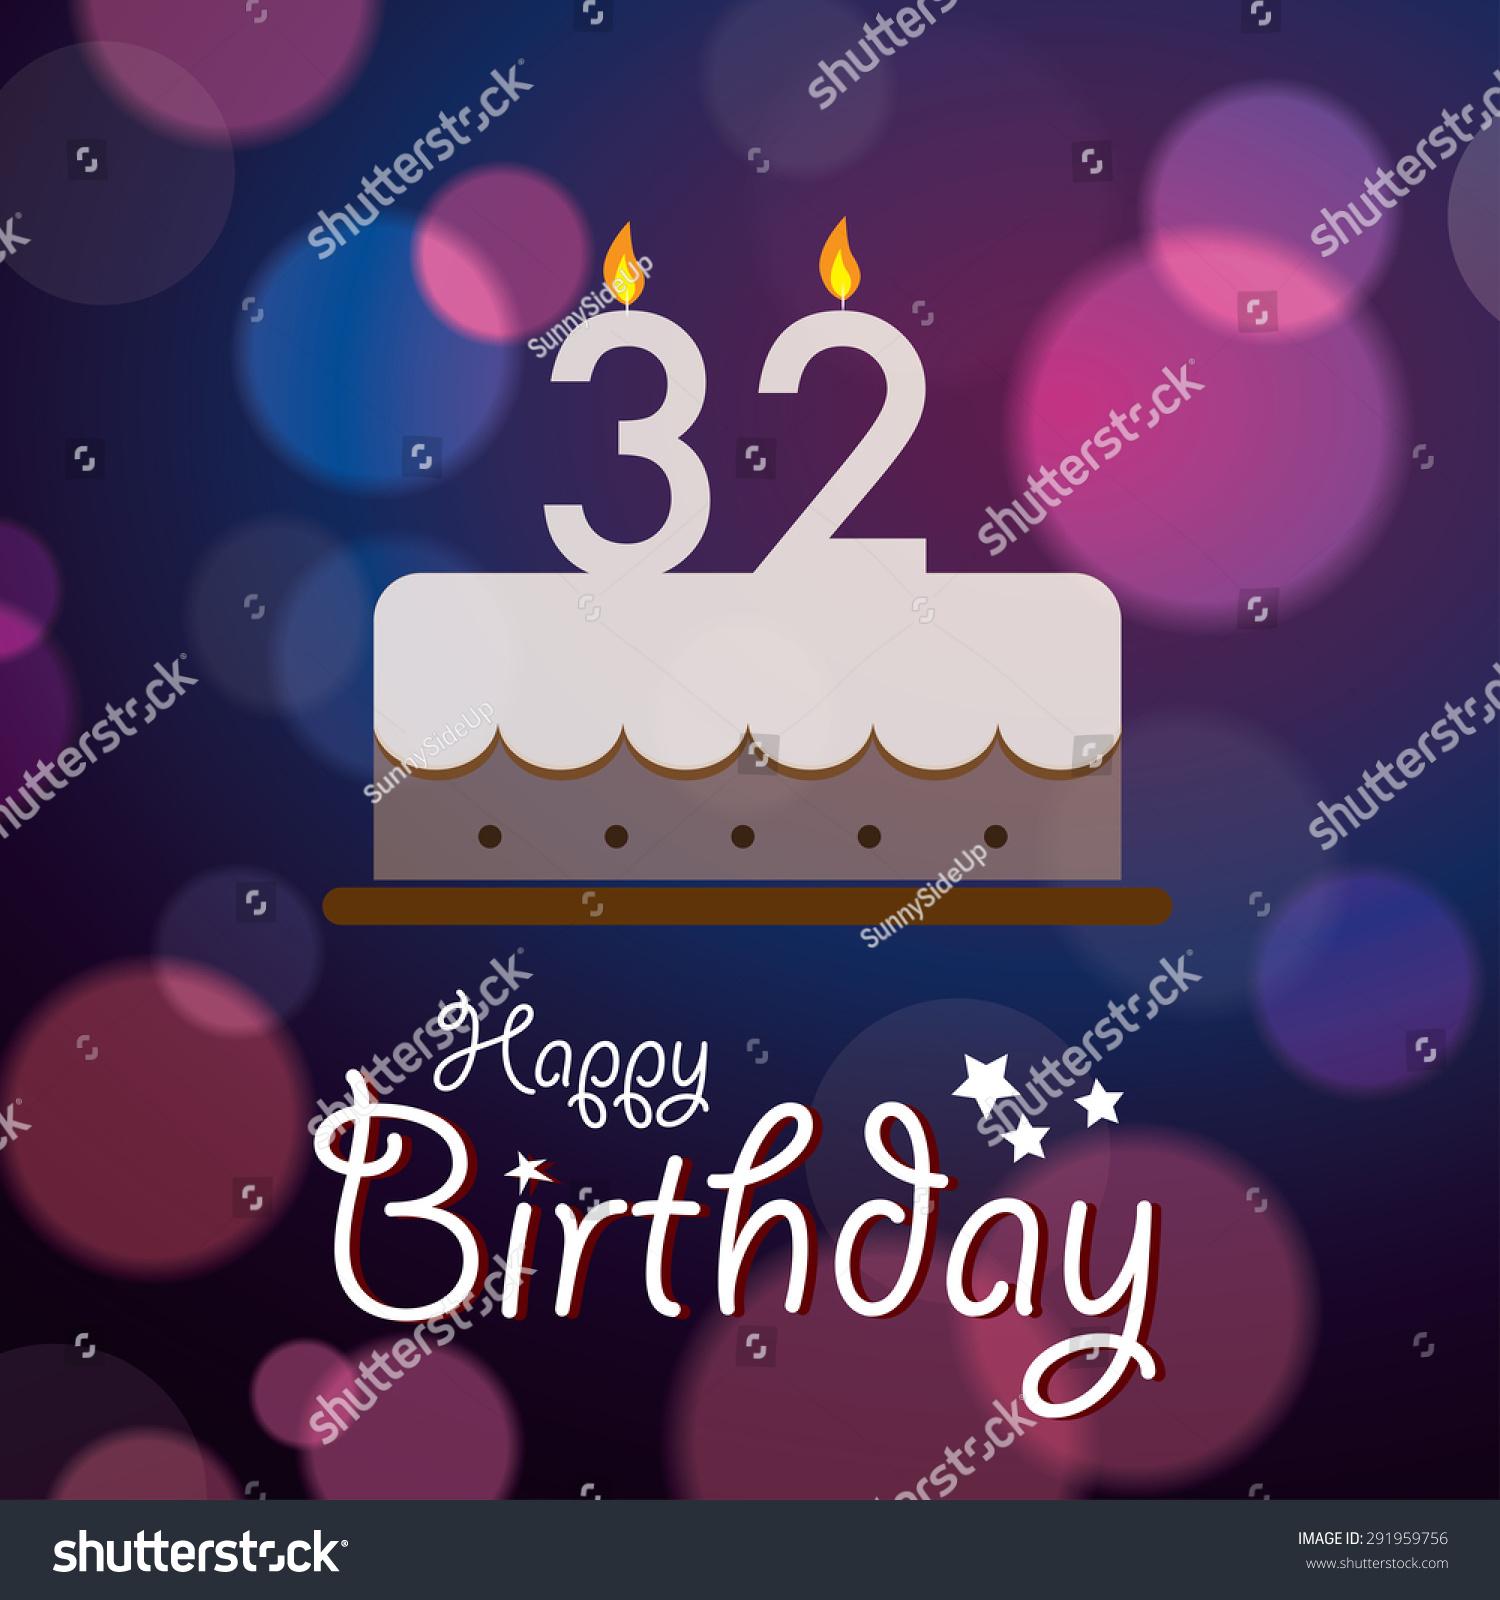 Happy 52nd Birthday Cake